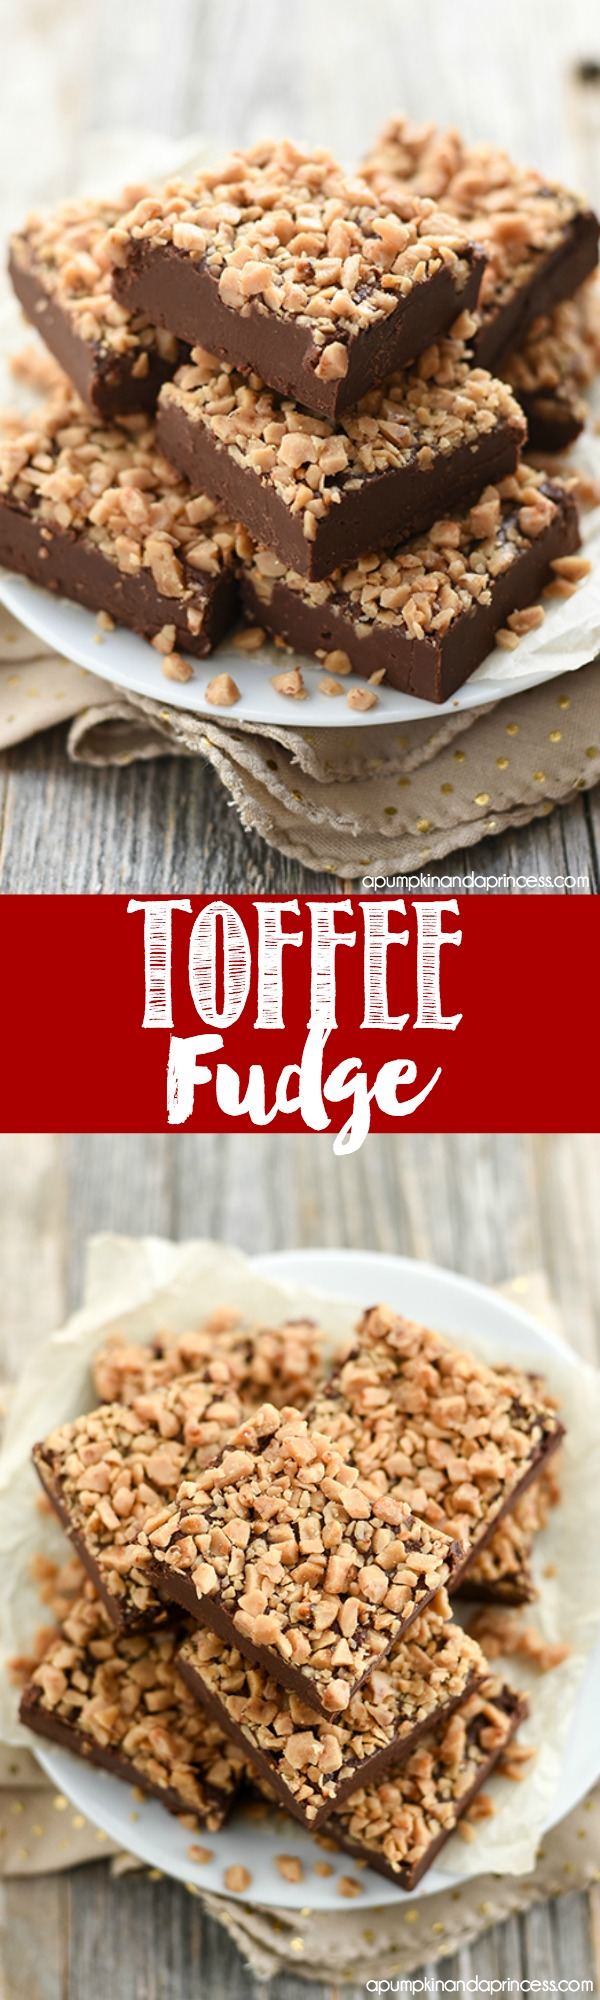 Easy Toffee Fudge Recipe